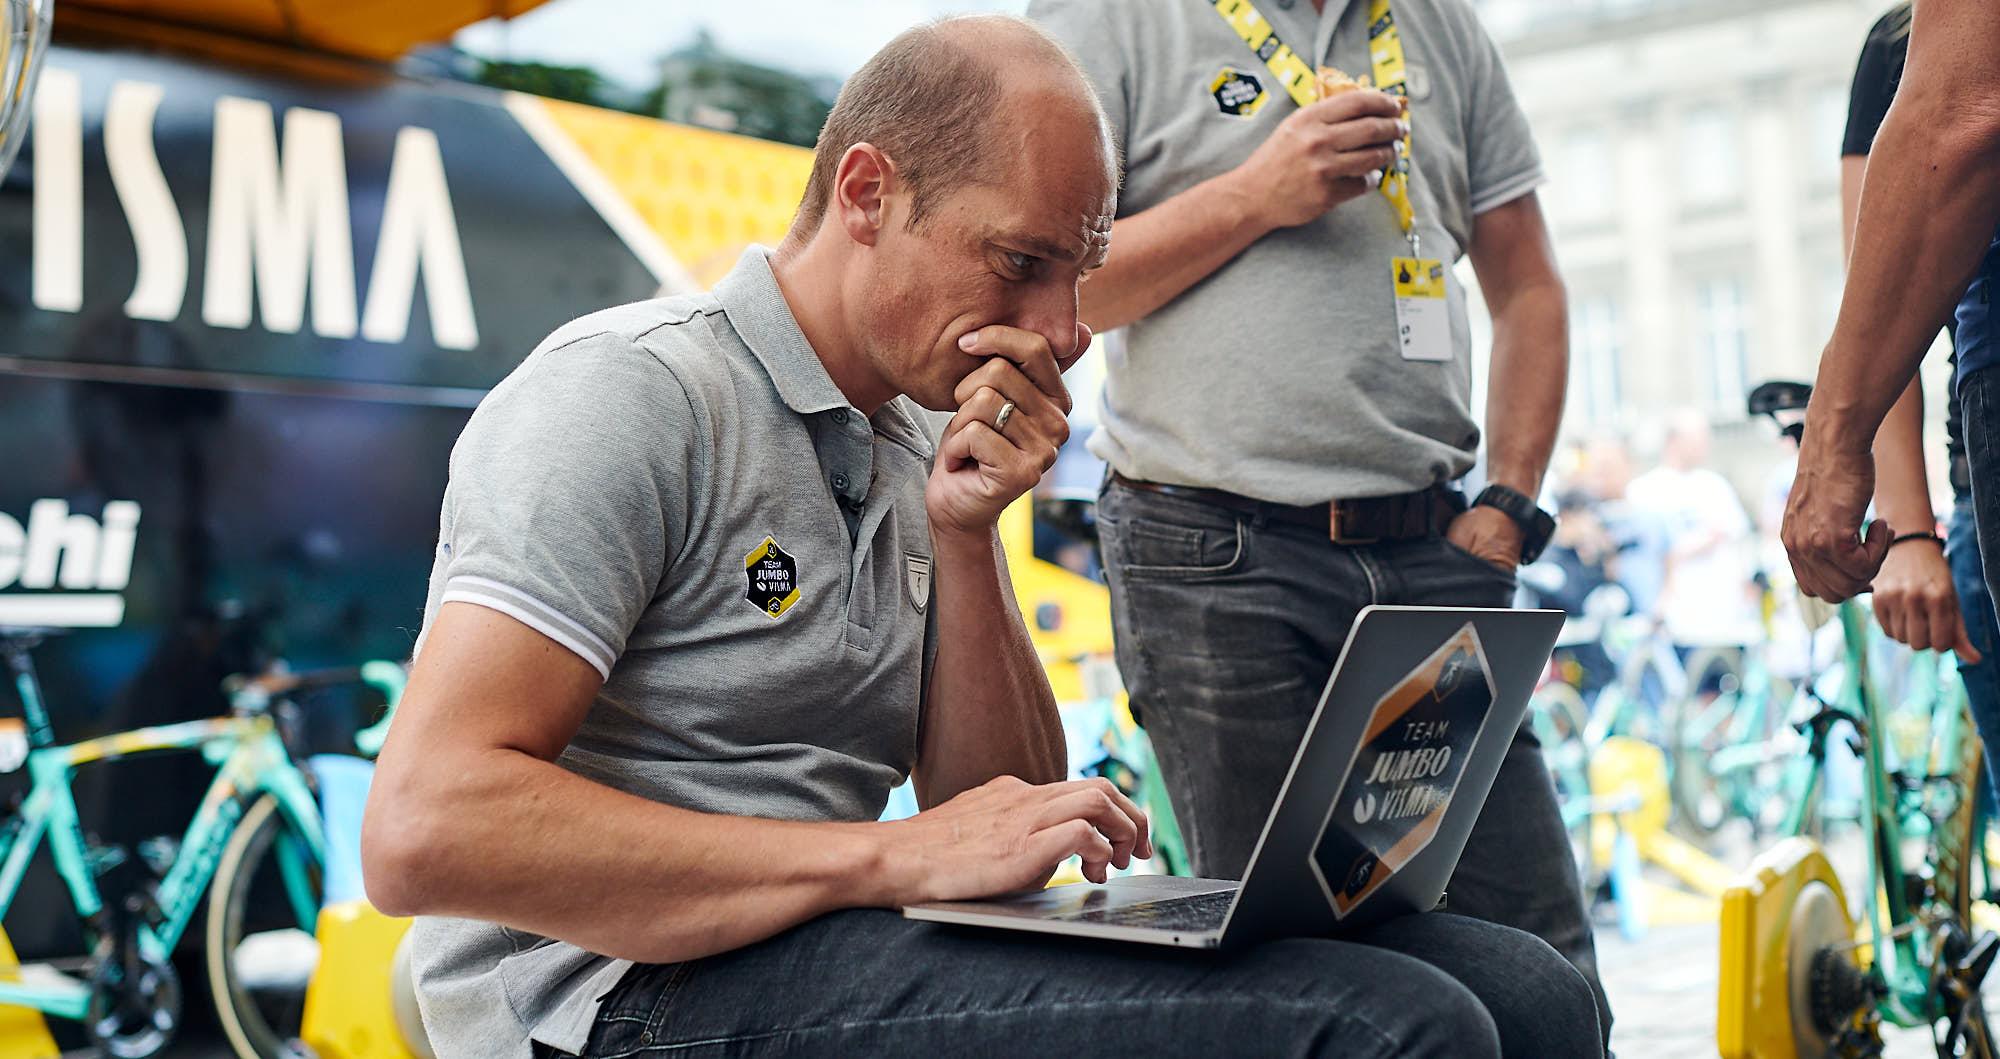 Head of performance at Jumbo-Visma Mathieu Heijboer during the 2019 Tour de France